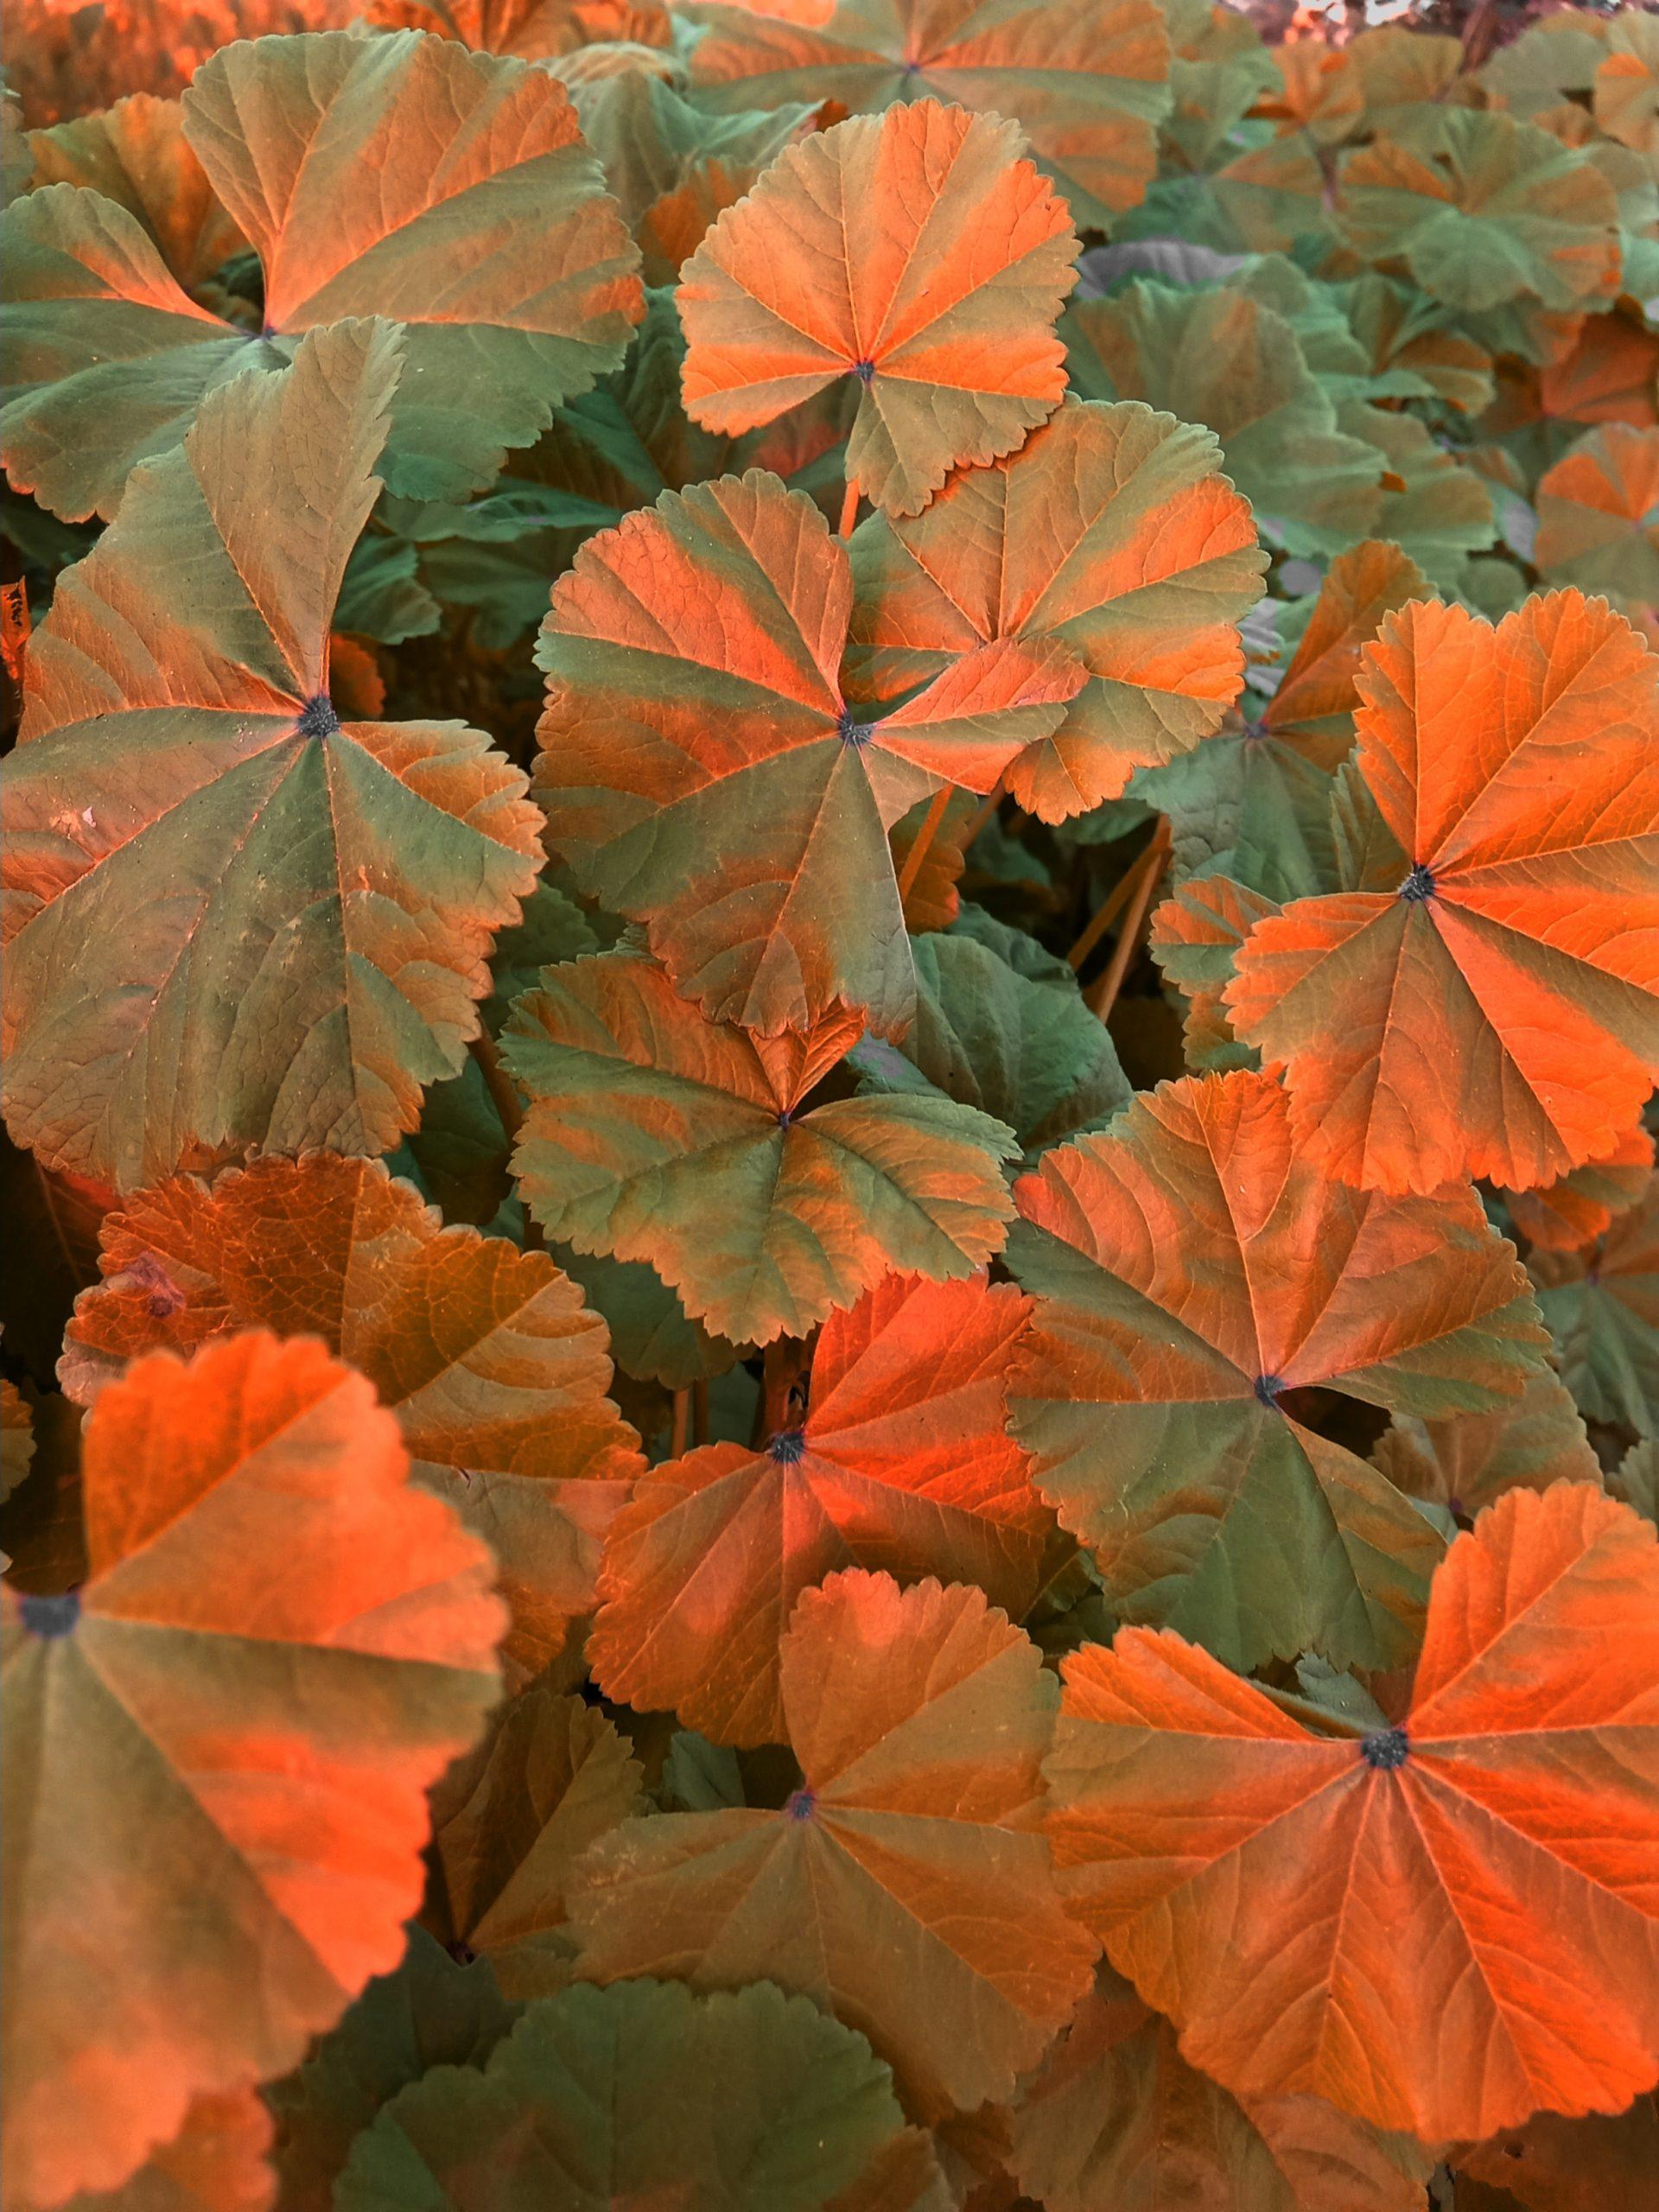 Sunlight on plant leaves